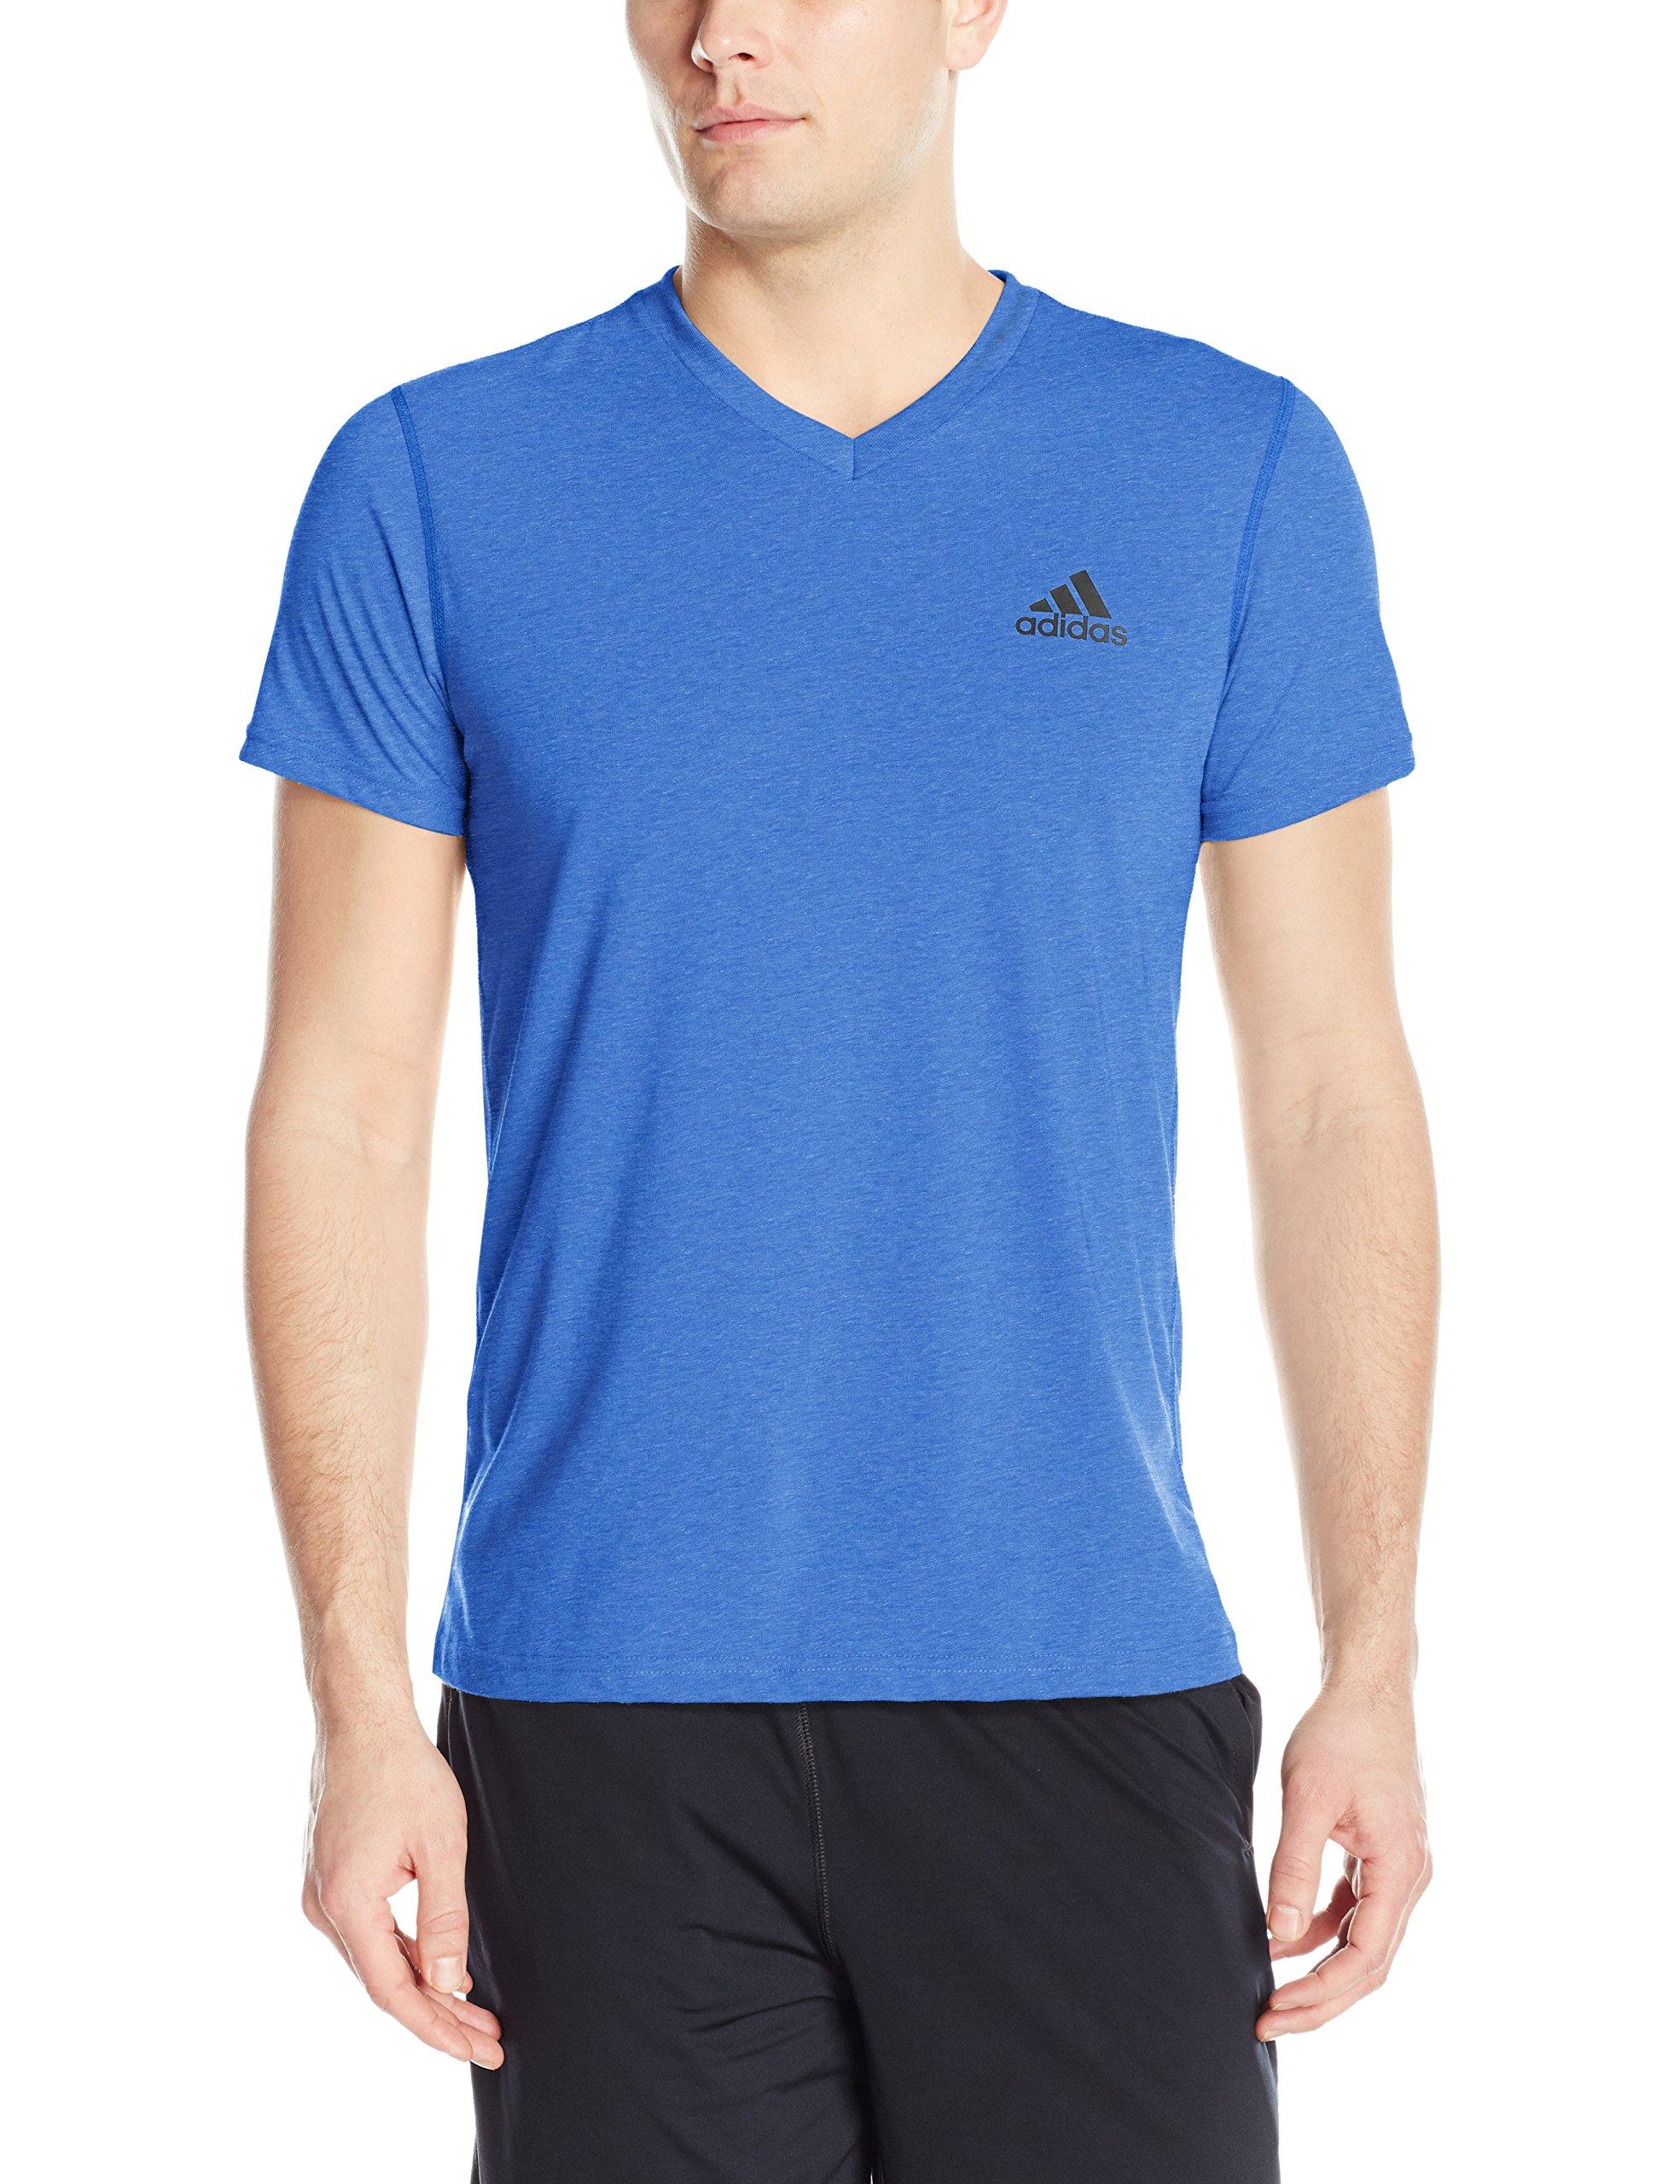 adidas Men's Training Ultimate Short Sleeve V-Neck Tee, Collegiate Royal/Collegiate Royal, Medium